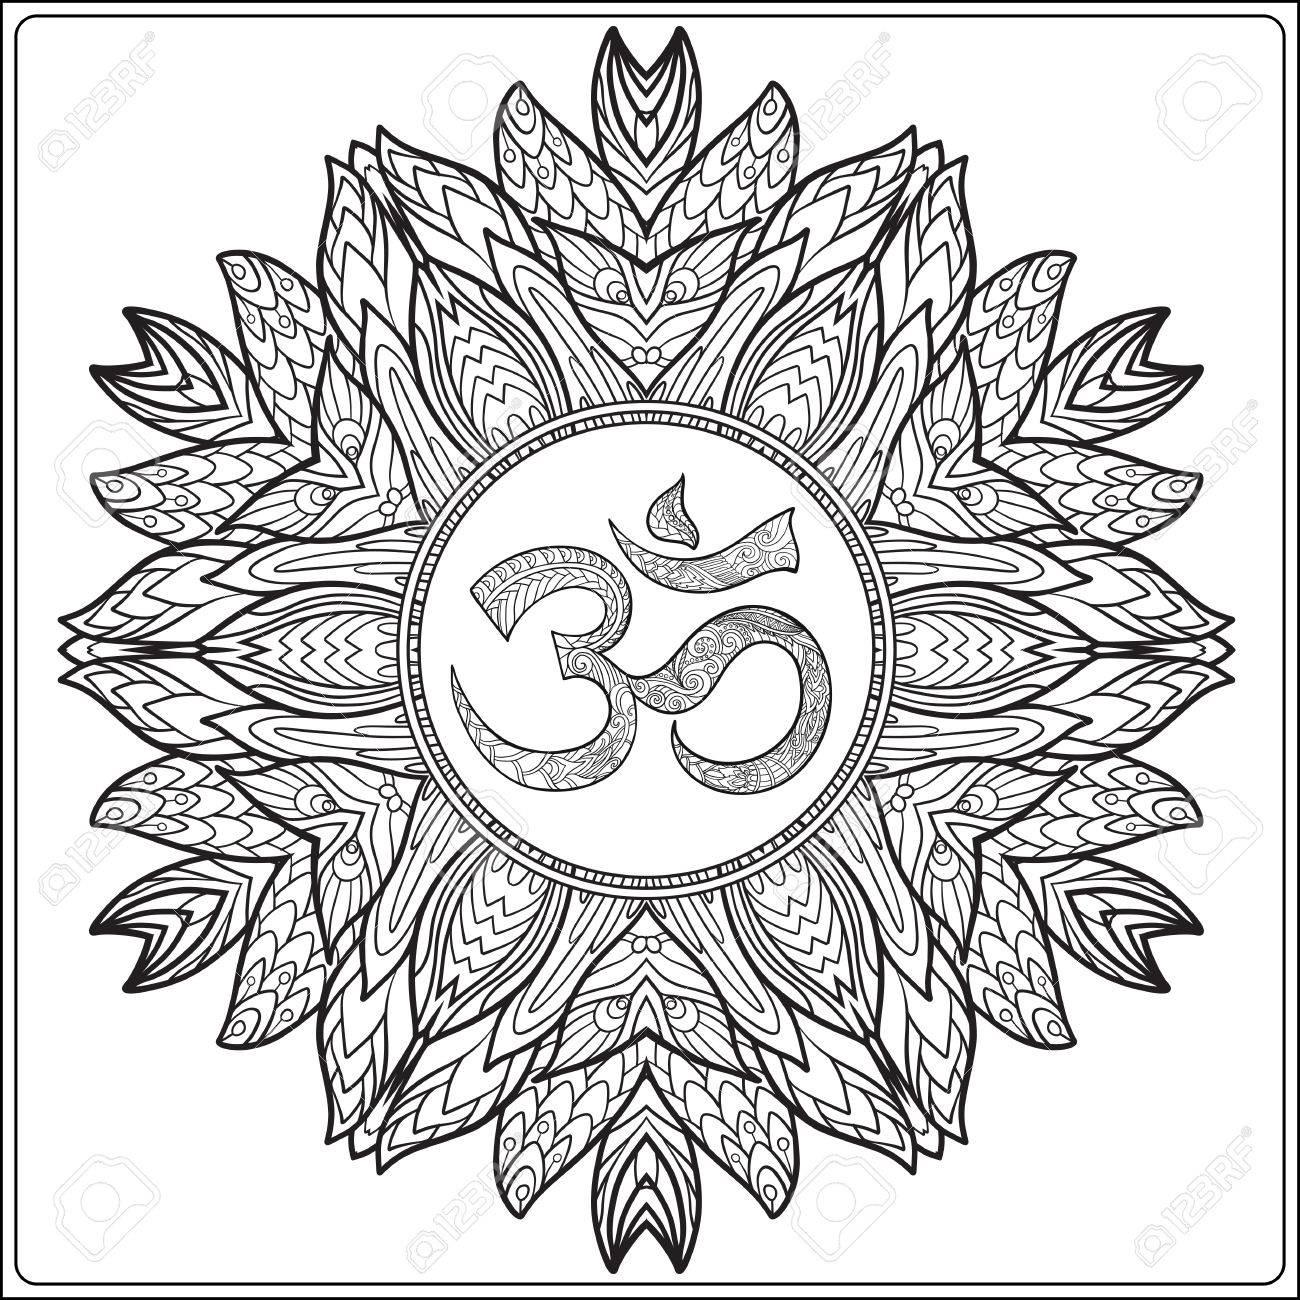 1300x1300 Deco Mandala With Om Sign, Patterned Design Element, Ethnic Amulet